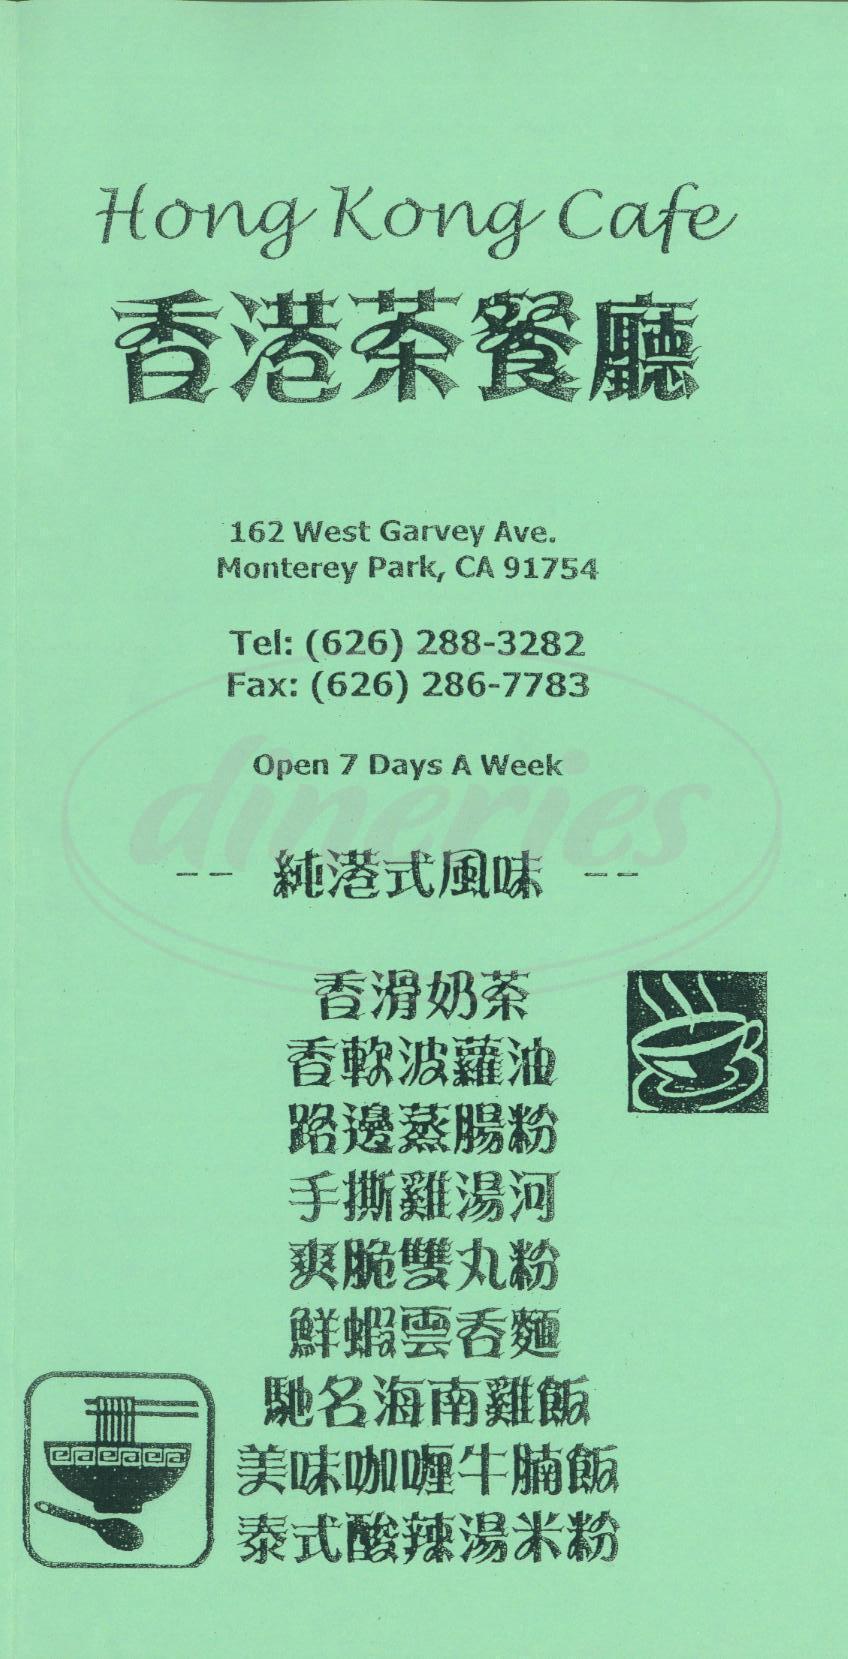 menu for Hong Kong Café